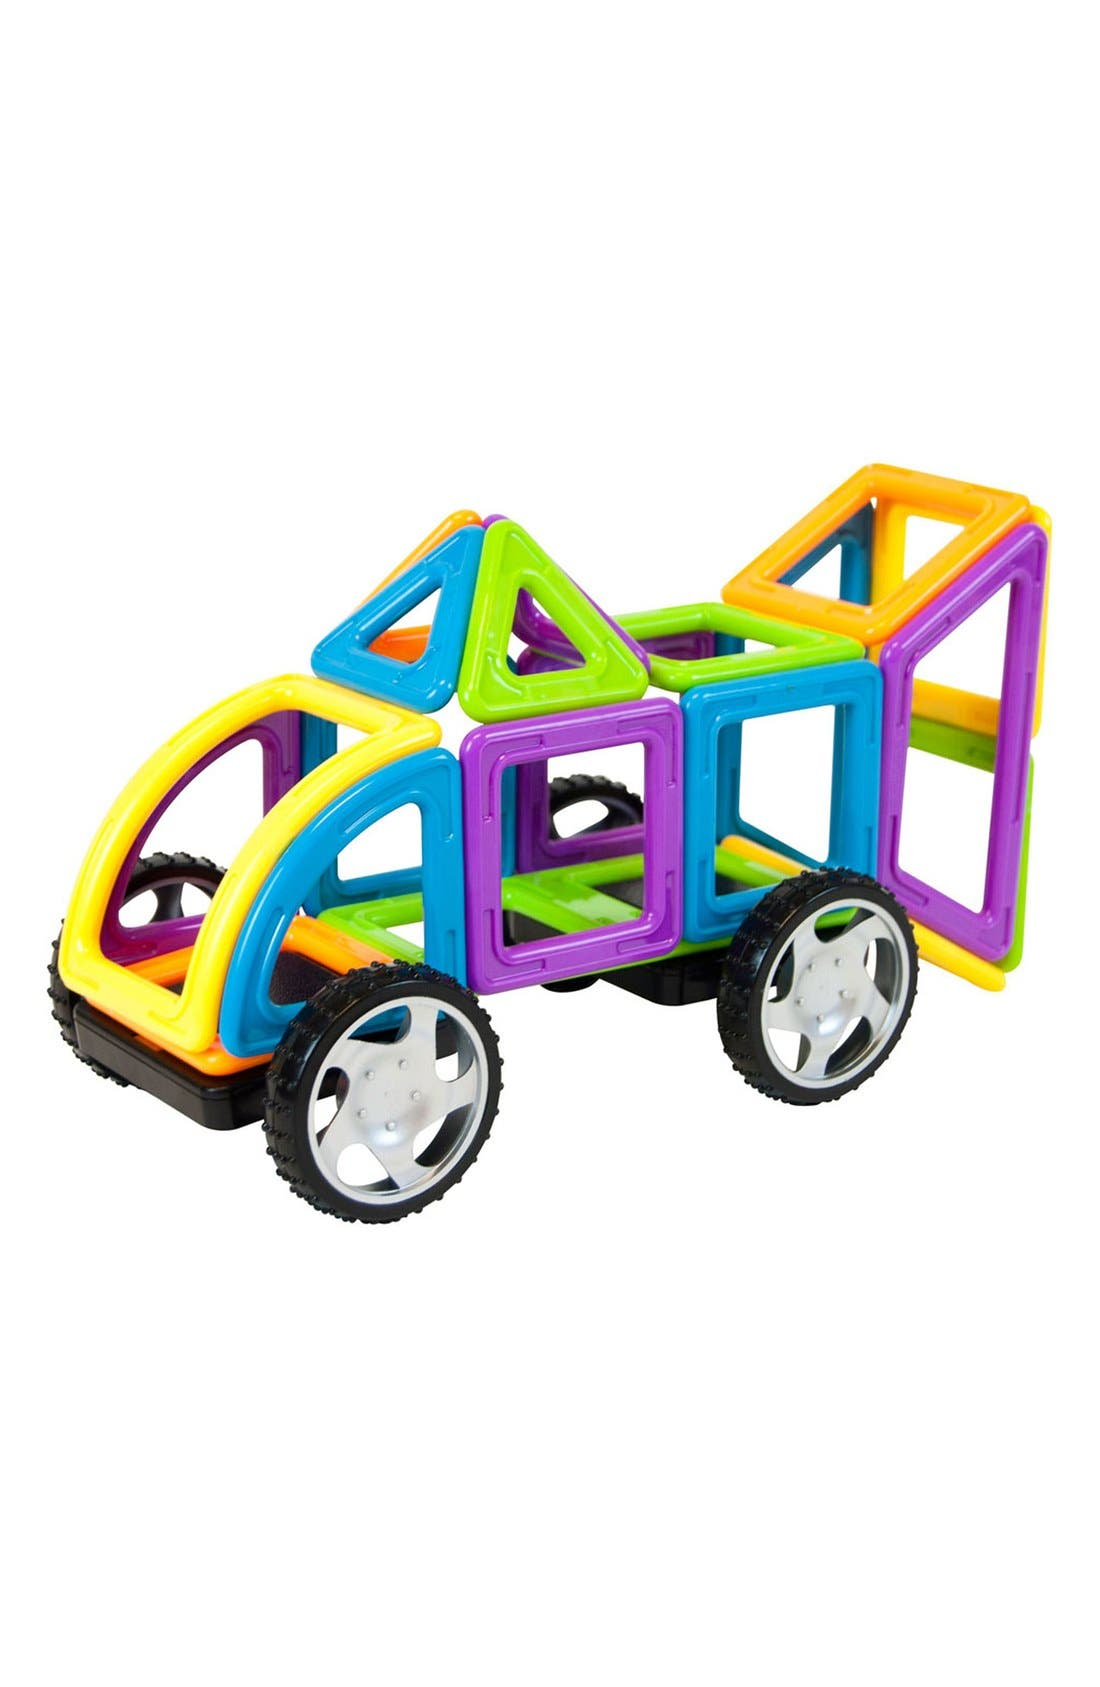 'Vehicle - WOW' Magnetic 3D Construction Set,                             Alternate thumbnail 7, color,                             Opaque Rainbow